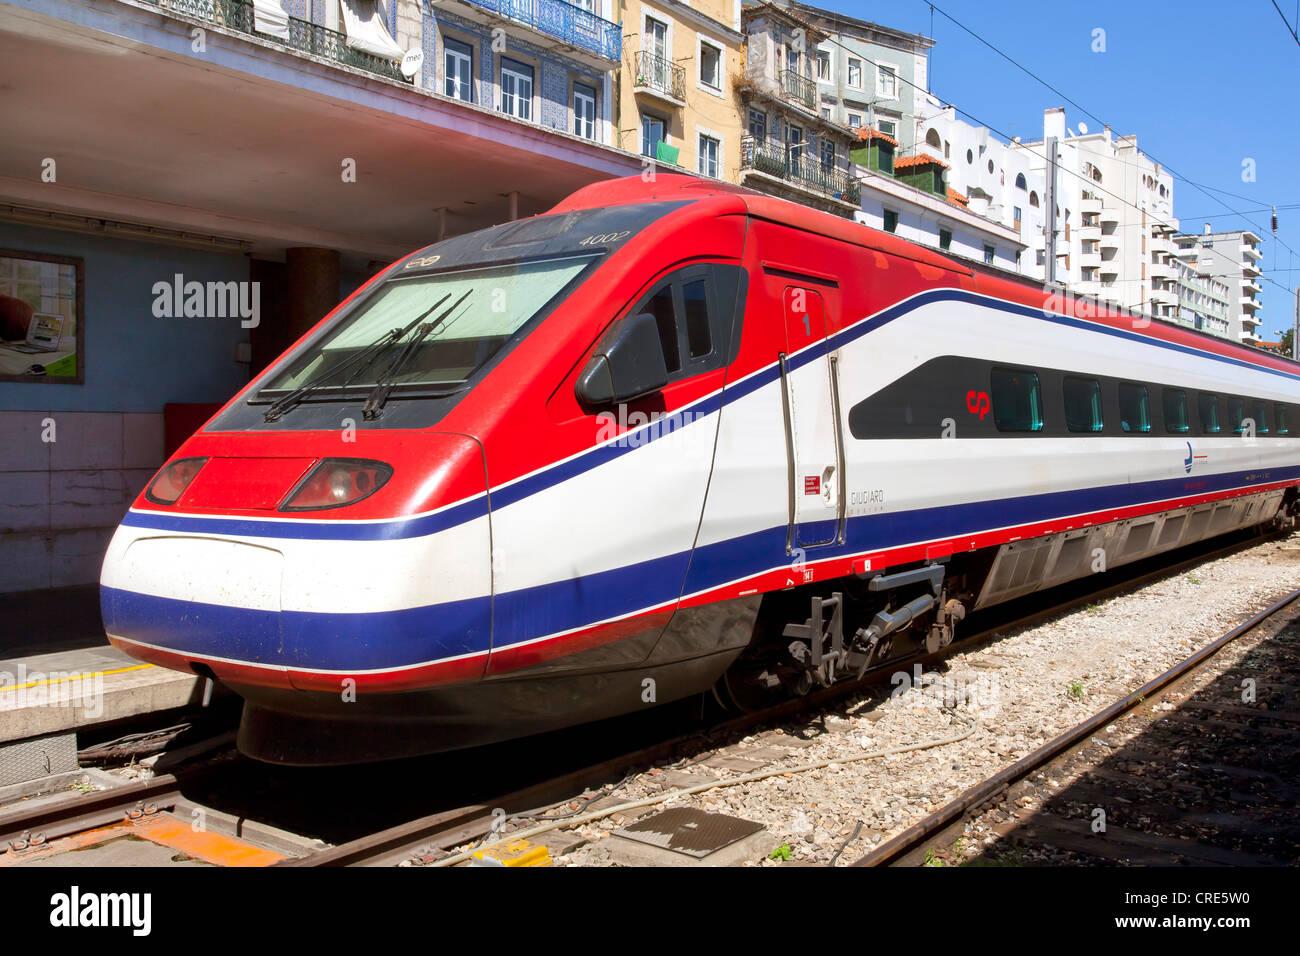 Alfa Pendular, high-speed train of the Portuguese state railway CP, Comboios de Portugal, in Santa Apolonia Railway - Stock Image